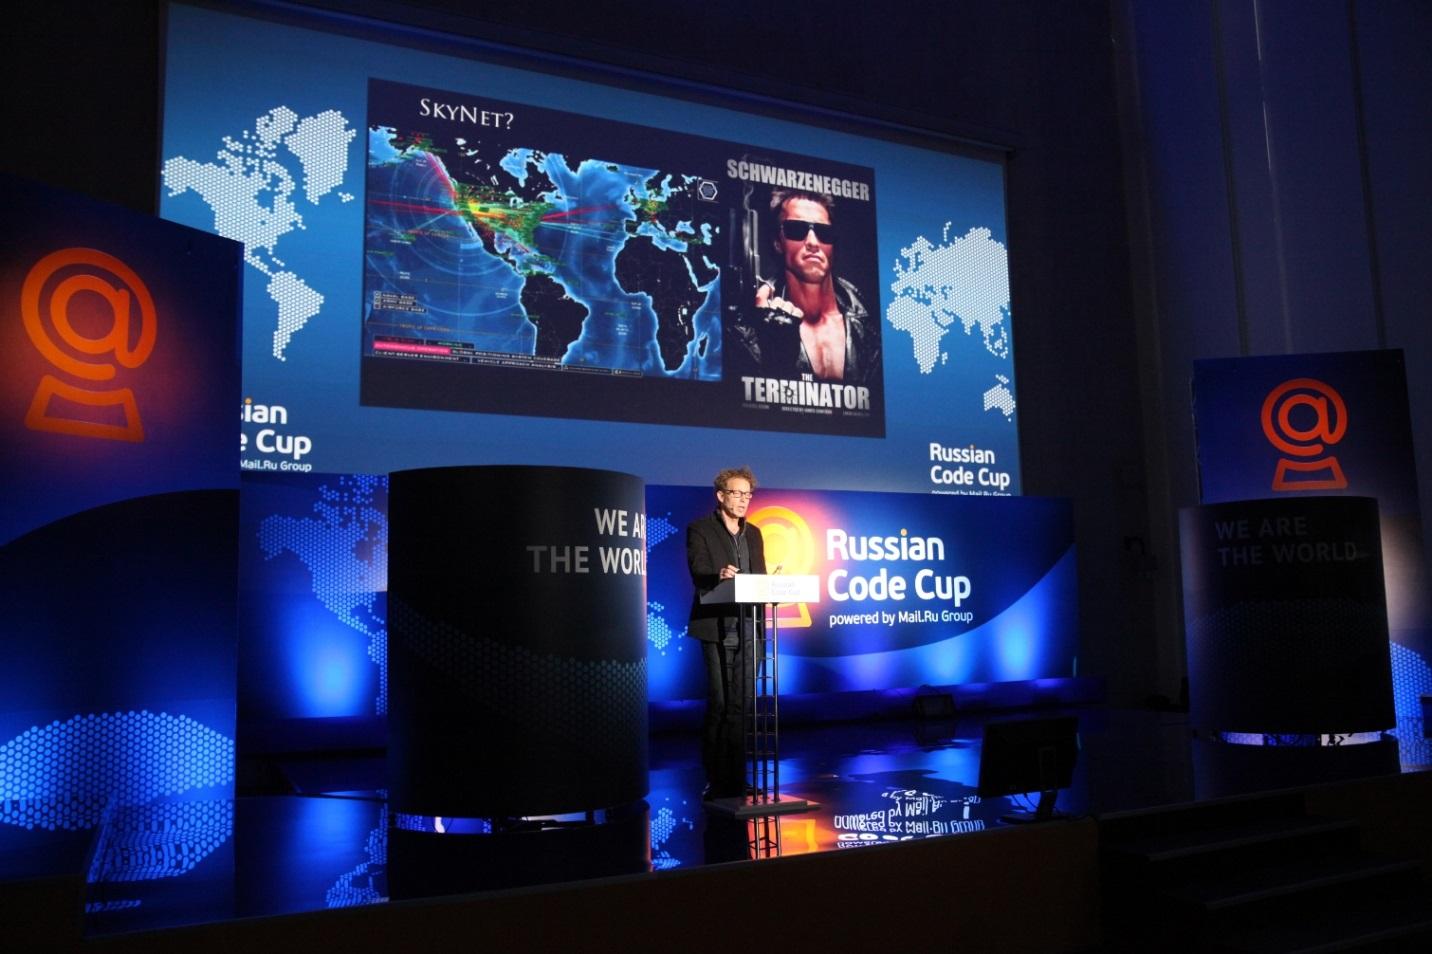 Финал RussianCodeCup 2013: Фоторепортаж